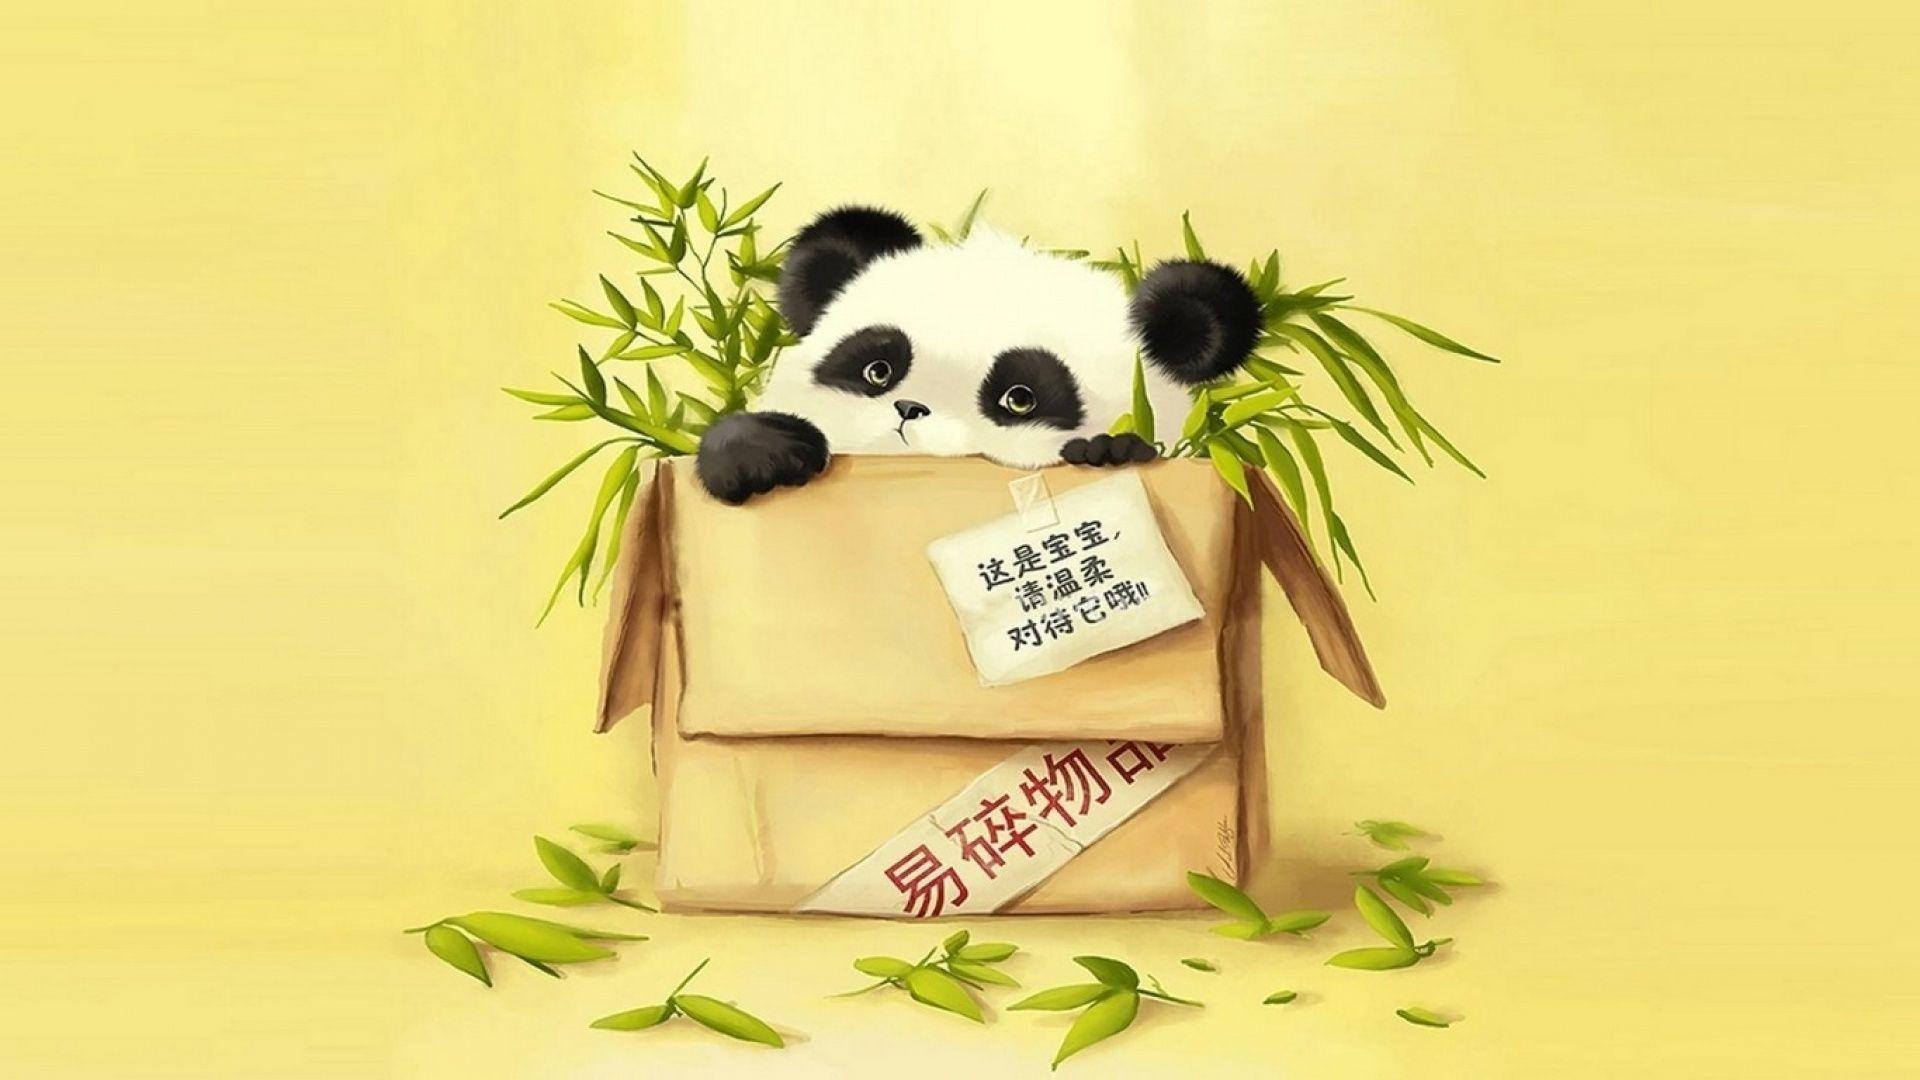 Cute Cartoon Animals Wallpaper 55 Images